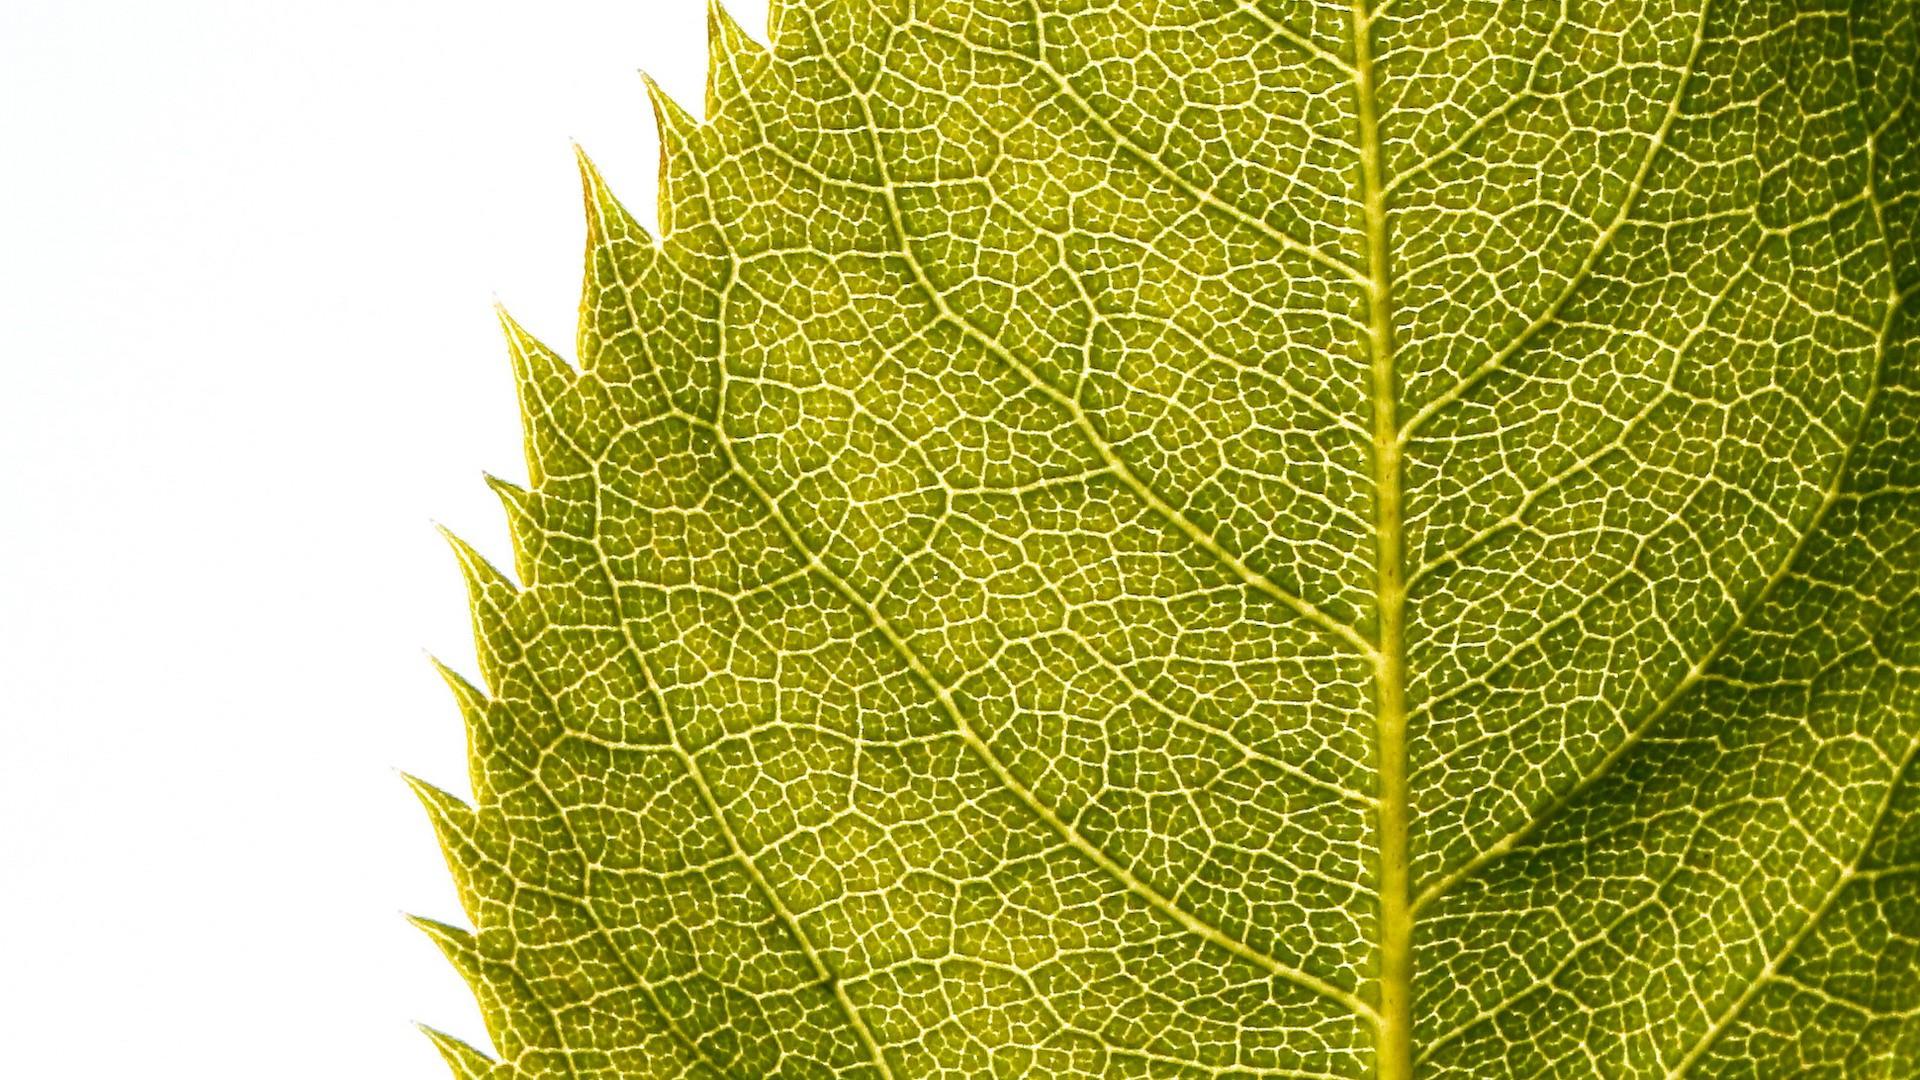 leaf background download free stunning high resolution